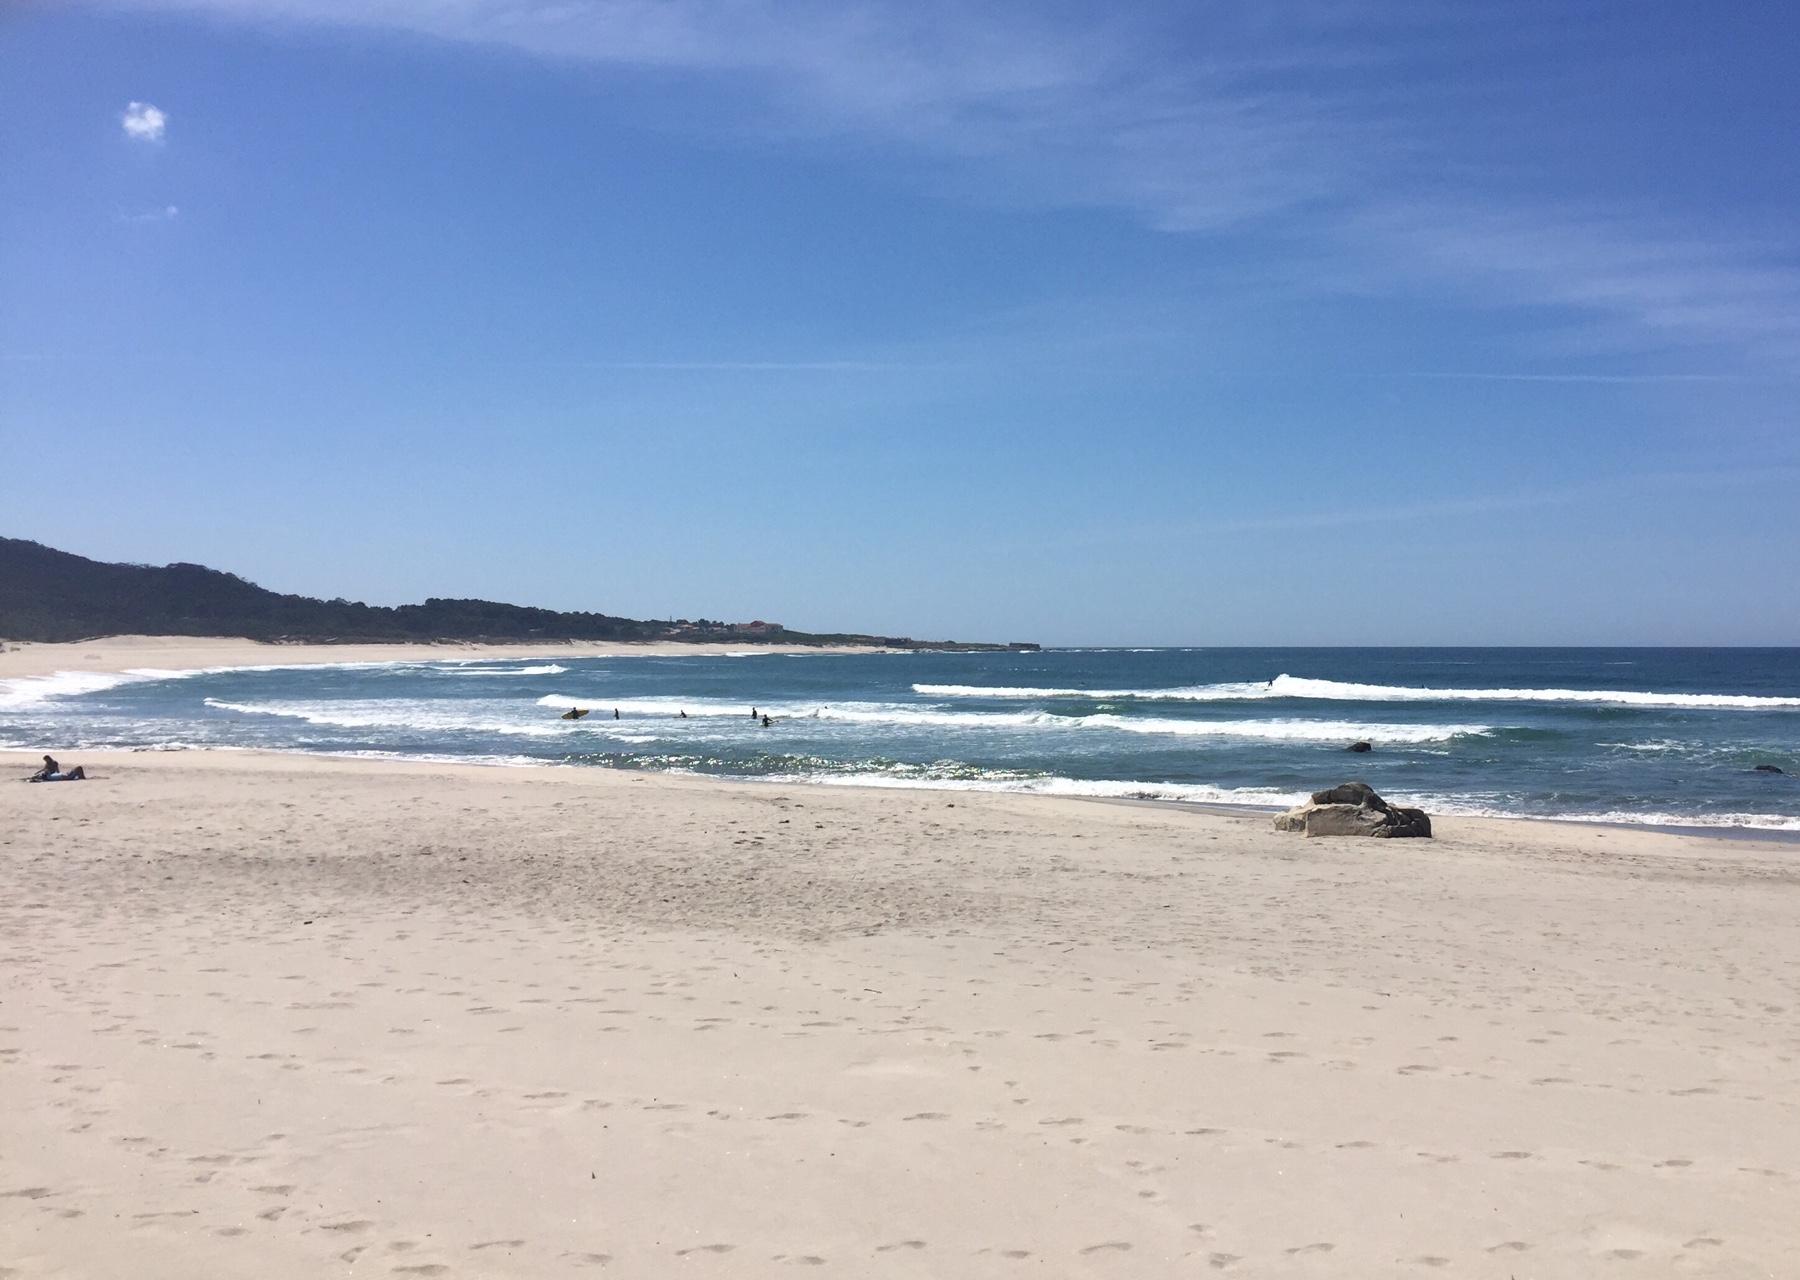 Traumhafte Bucht in Via Praia Ancora, Caminho Portugues